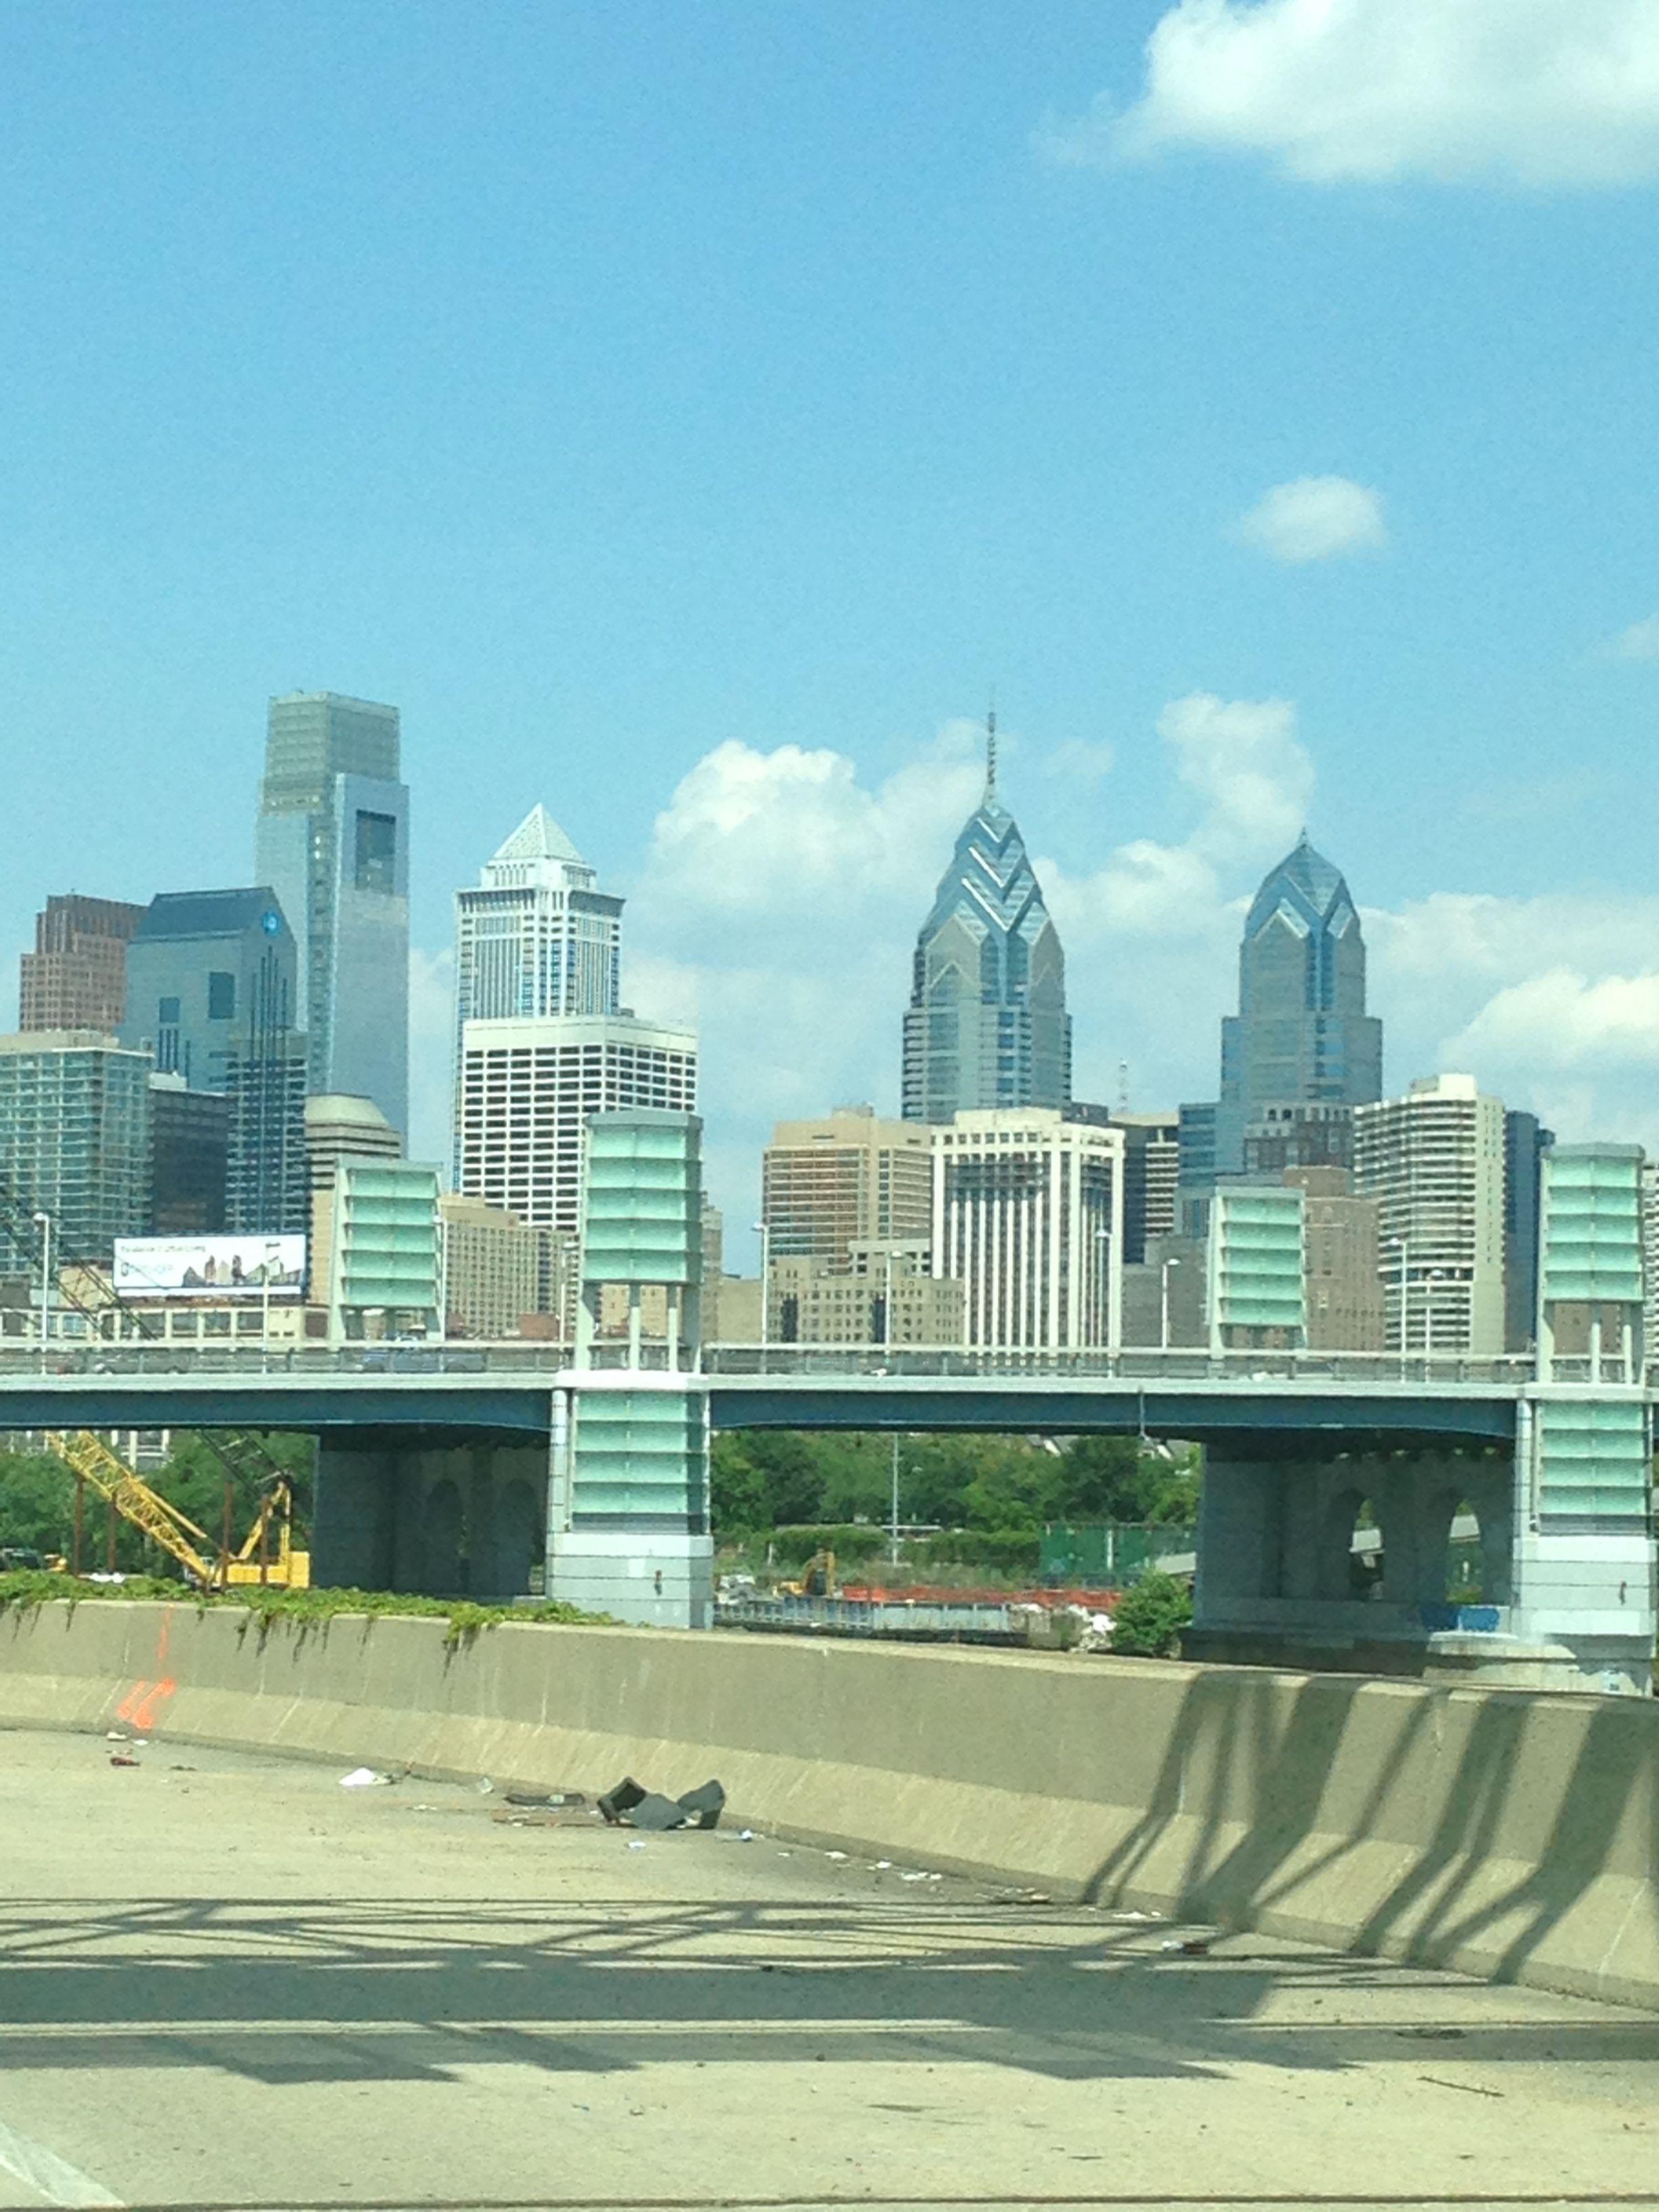 Skyline shot from the #schulkill #philadelphia #philly